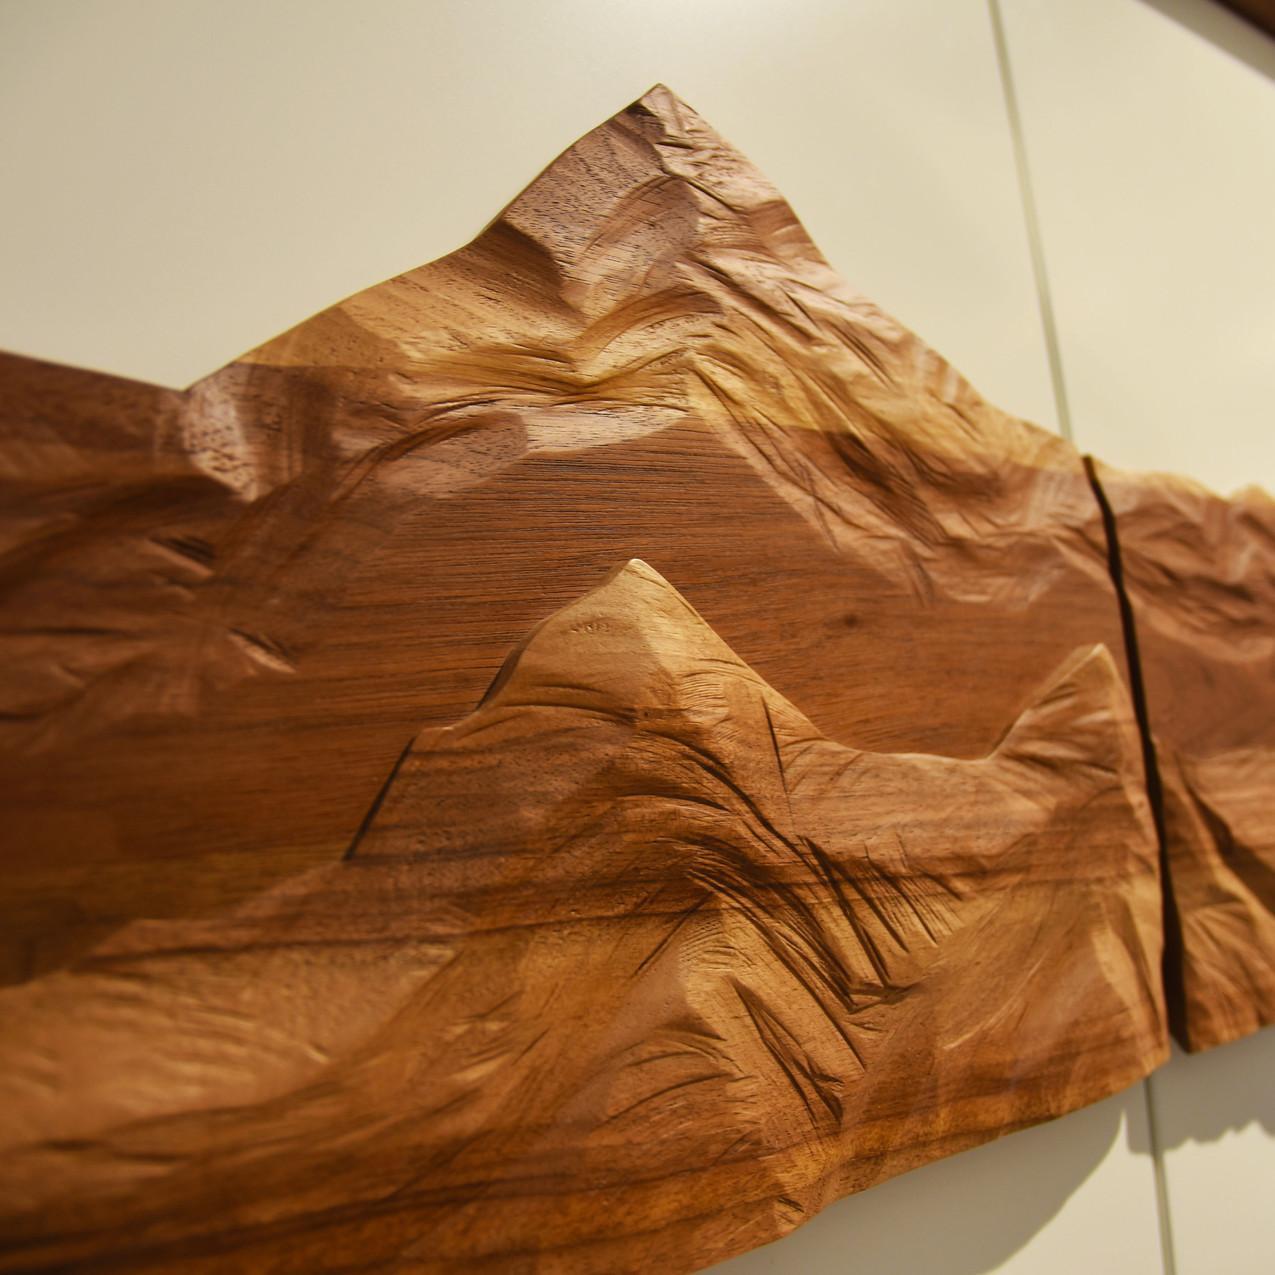 Bergrelief aus Holz